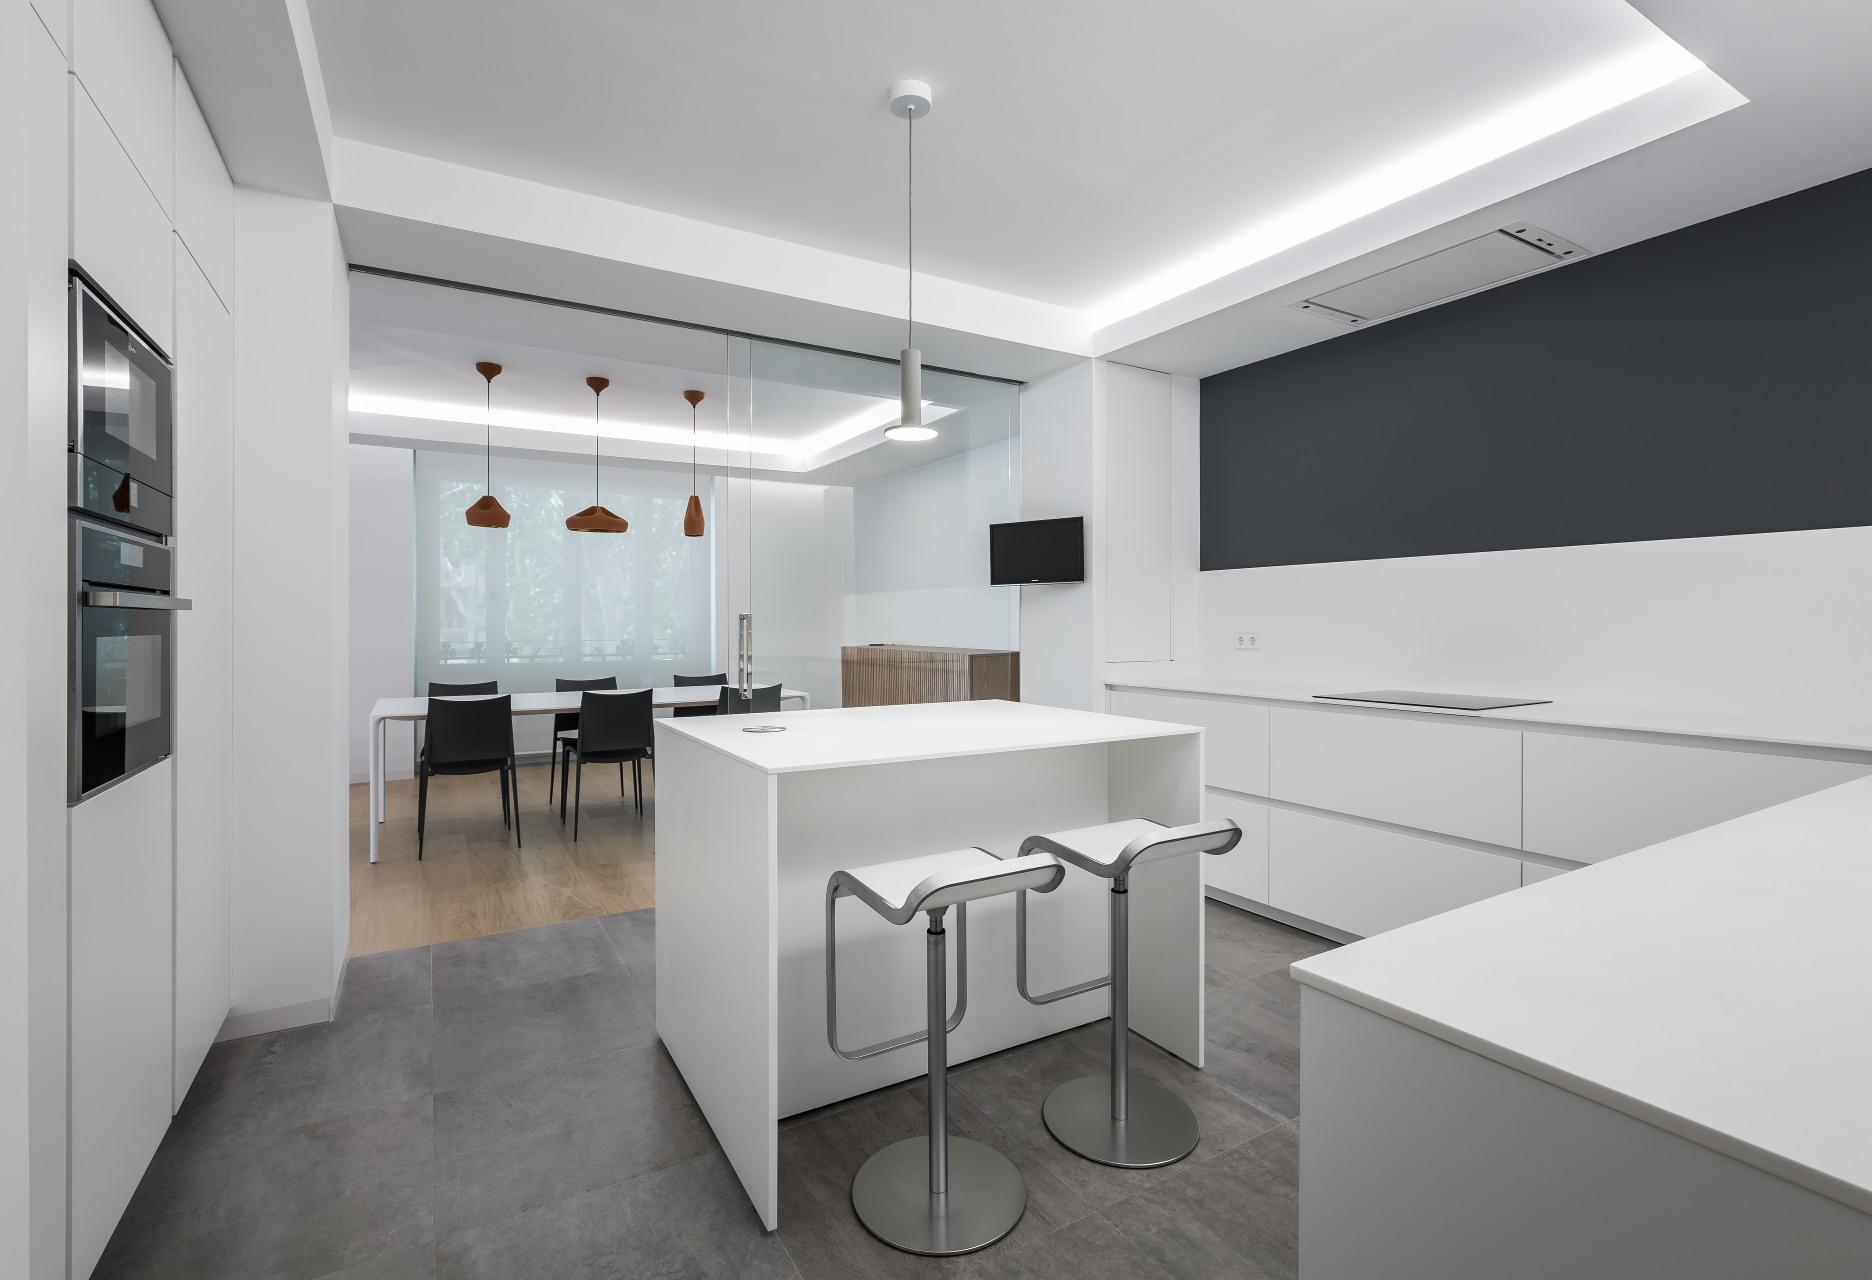 fotografia-arquitectura-interiorismo-valencia-german-cabo-gallardo-llopis-bfm-edificatoria-turia02 (10)